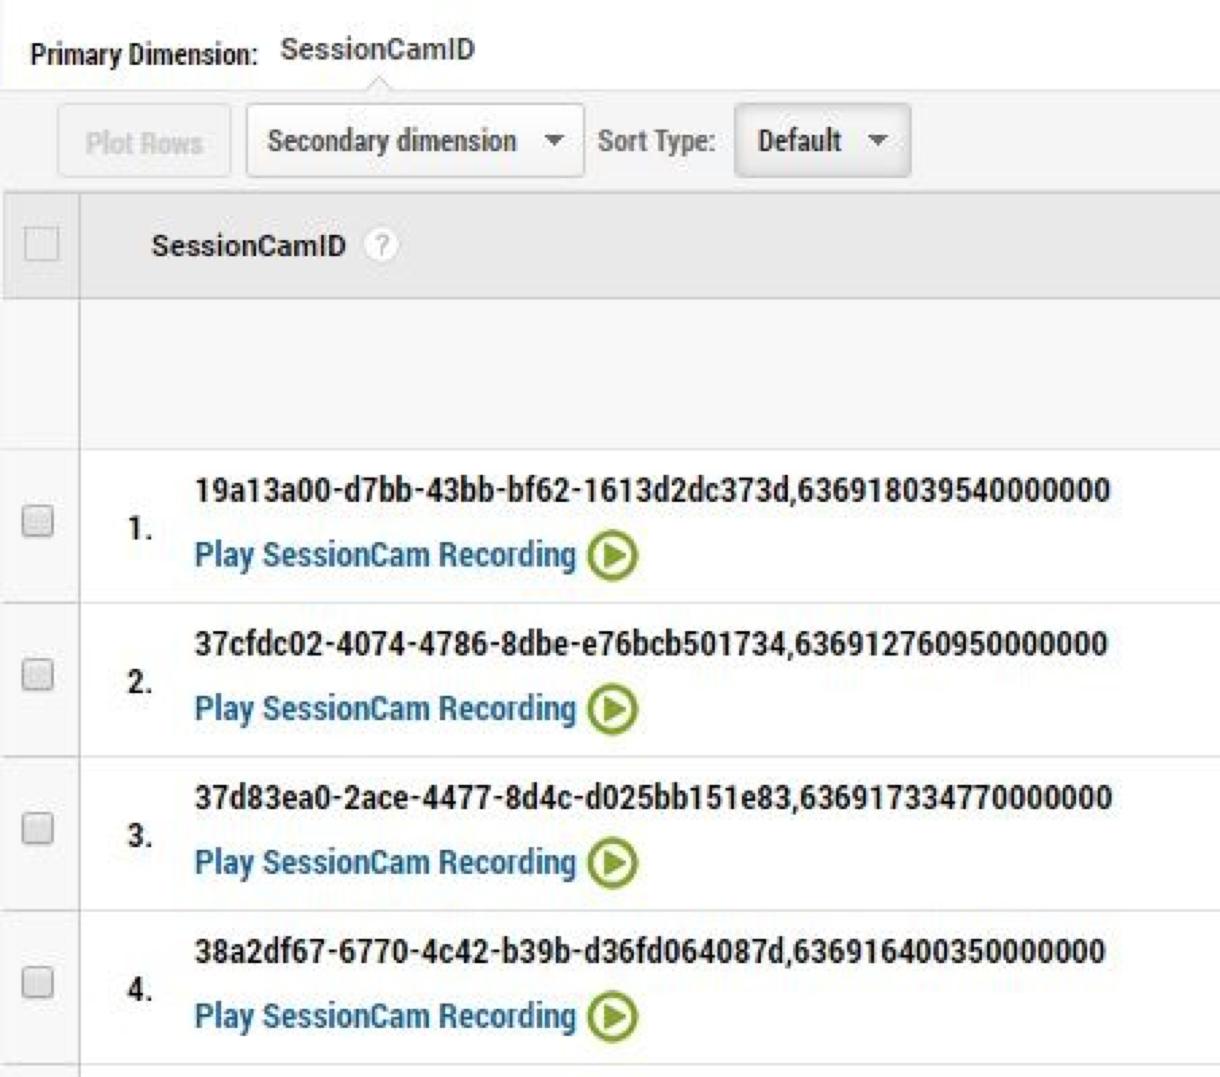 SessionCam Integrations